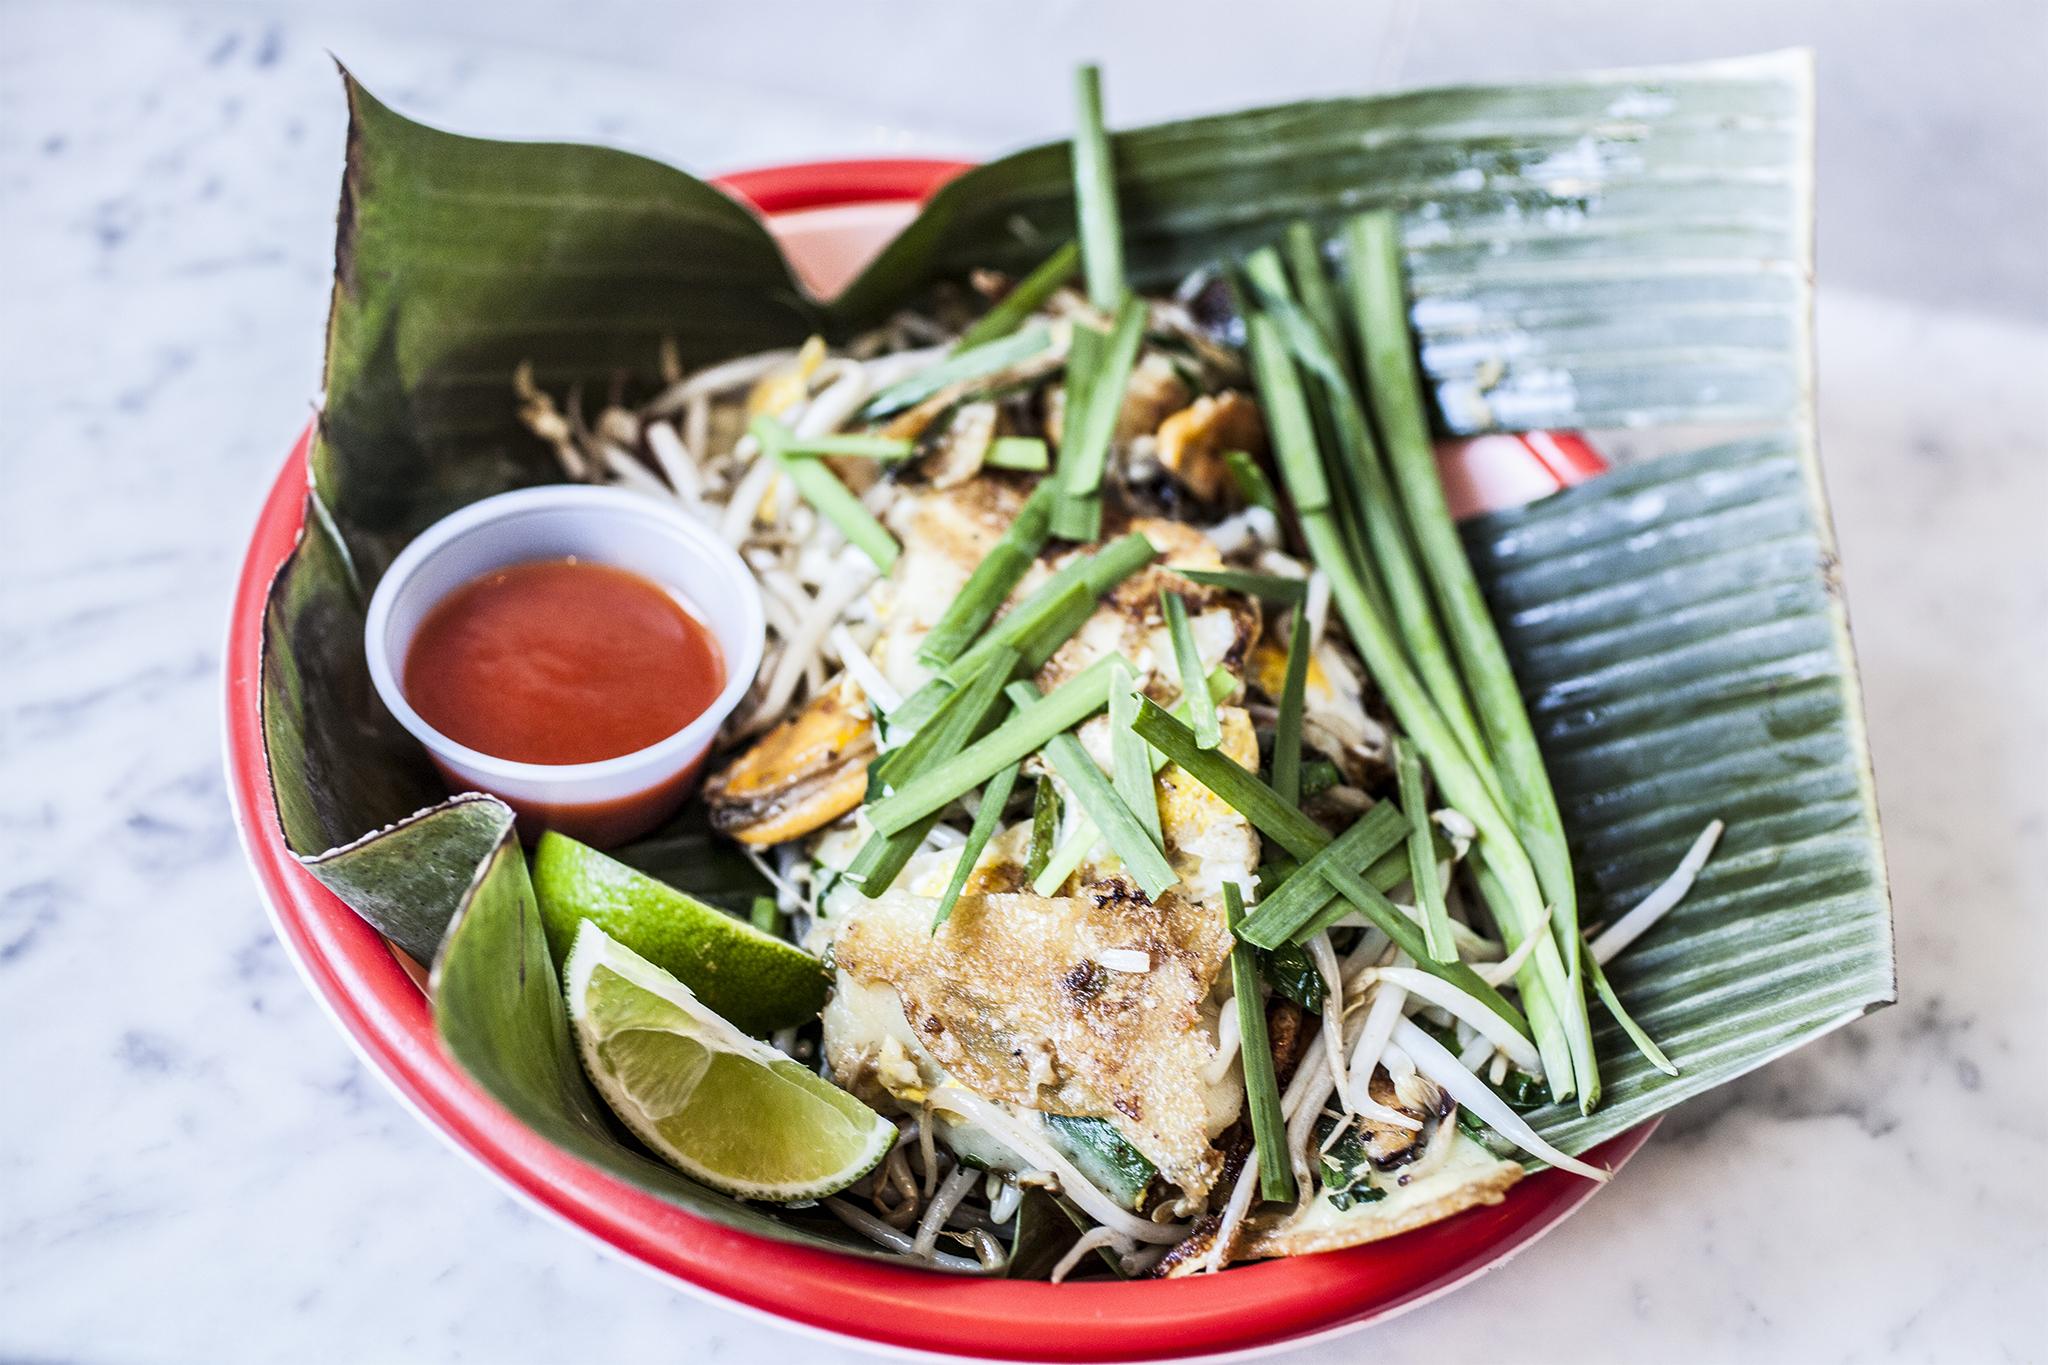 The Bangkok noodle nook: Pok Pok Phat Thai